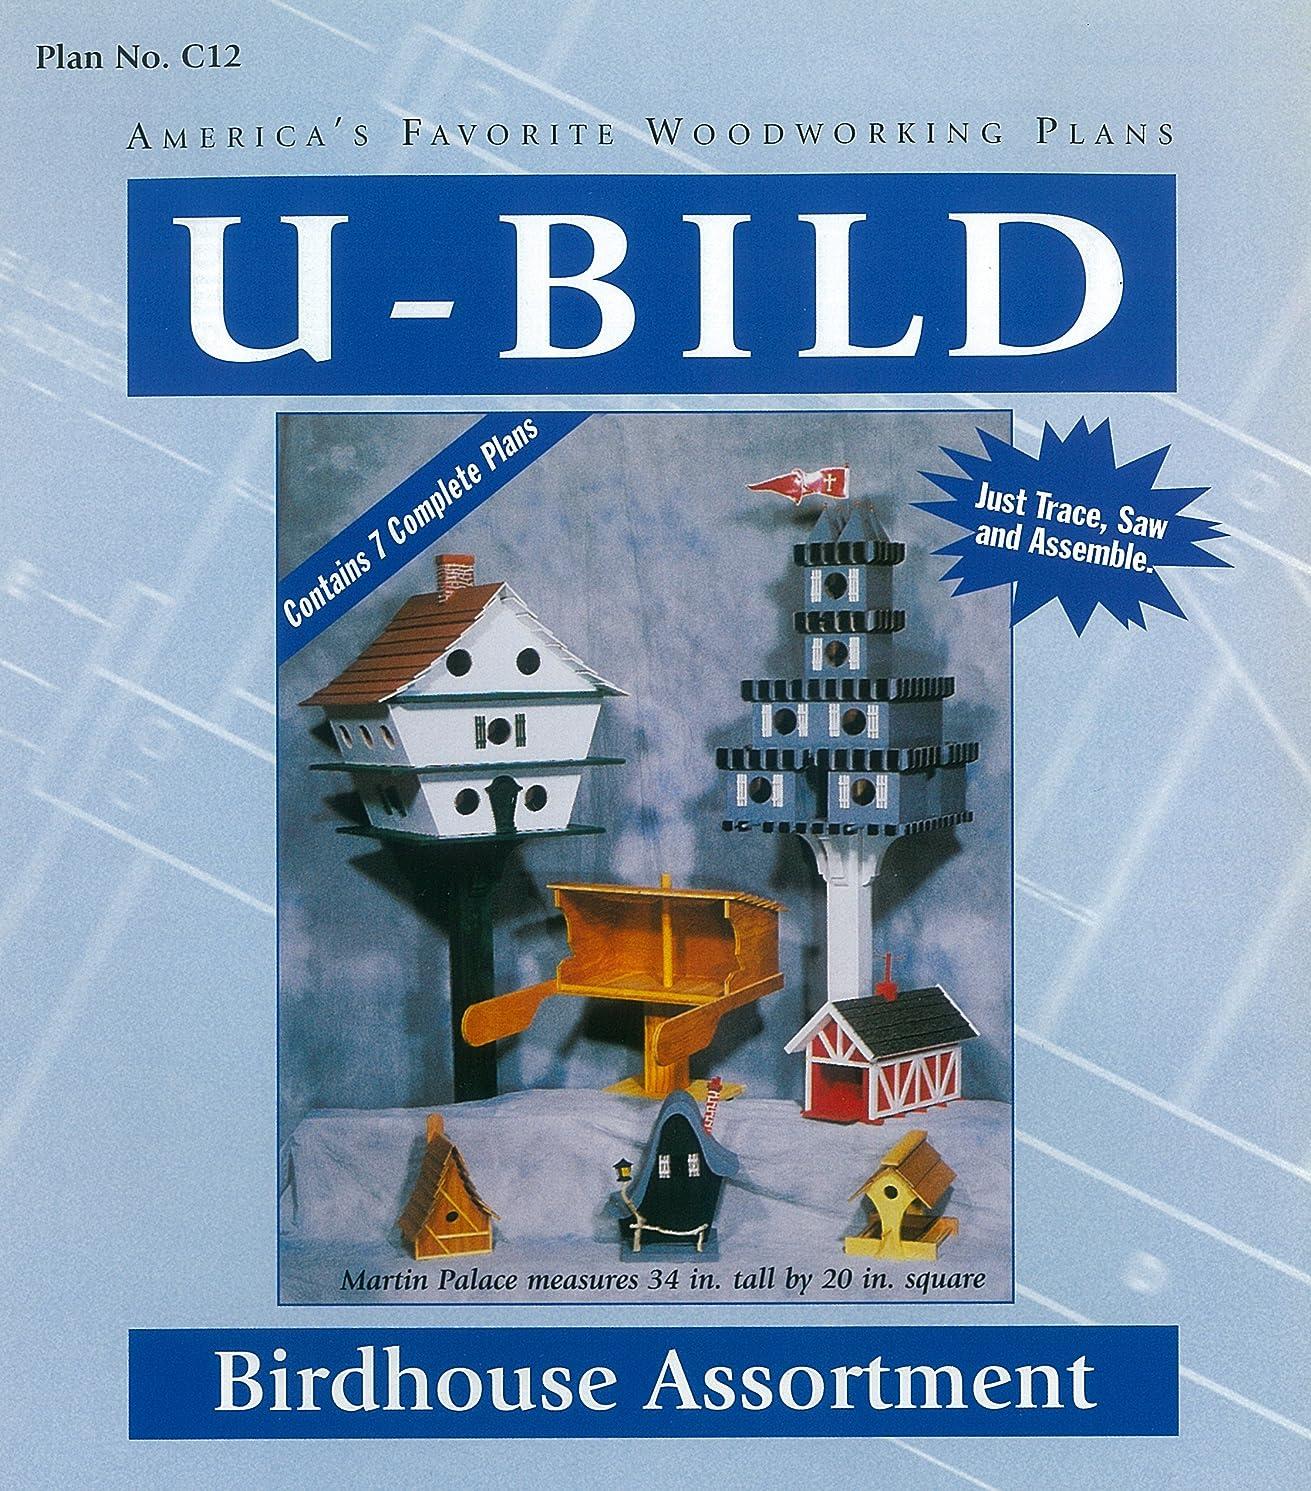 U-Bild C12 Birdhouse Assortment Project Plan